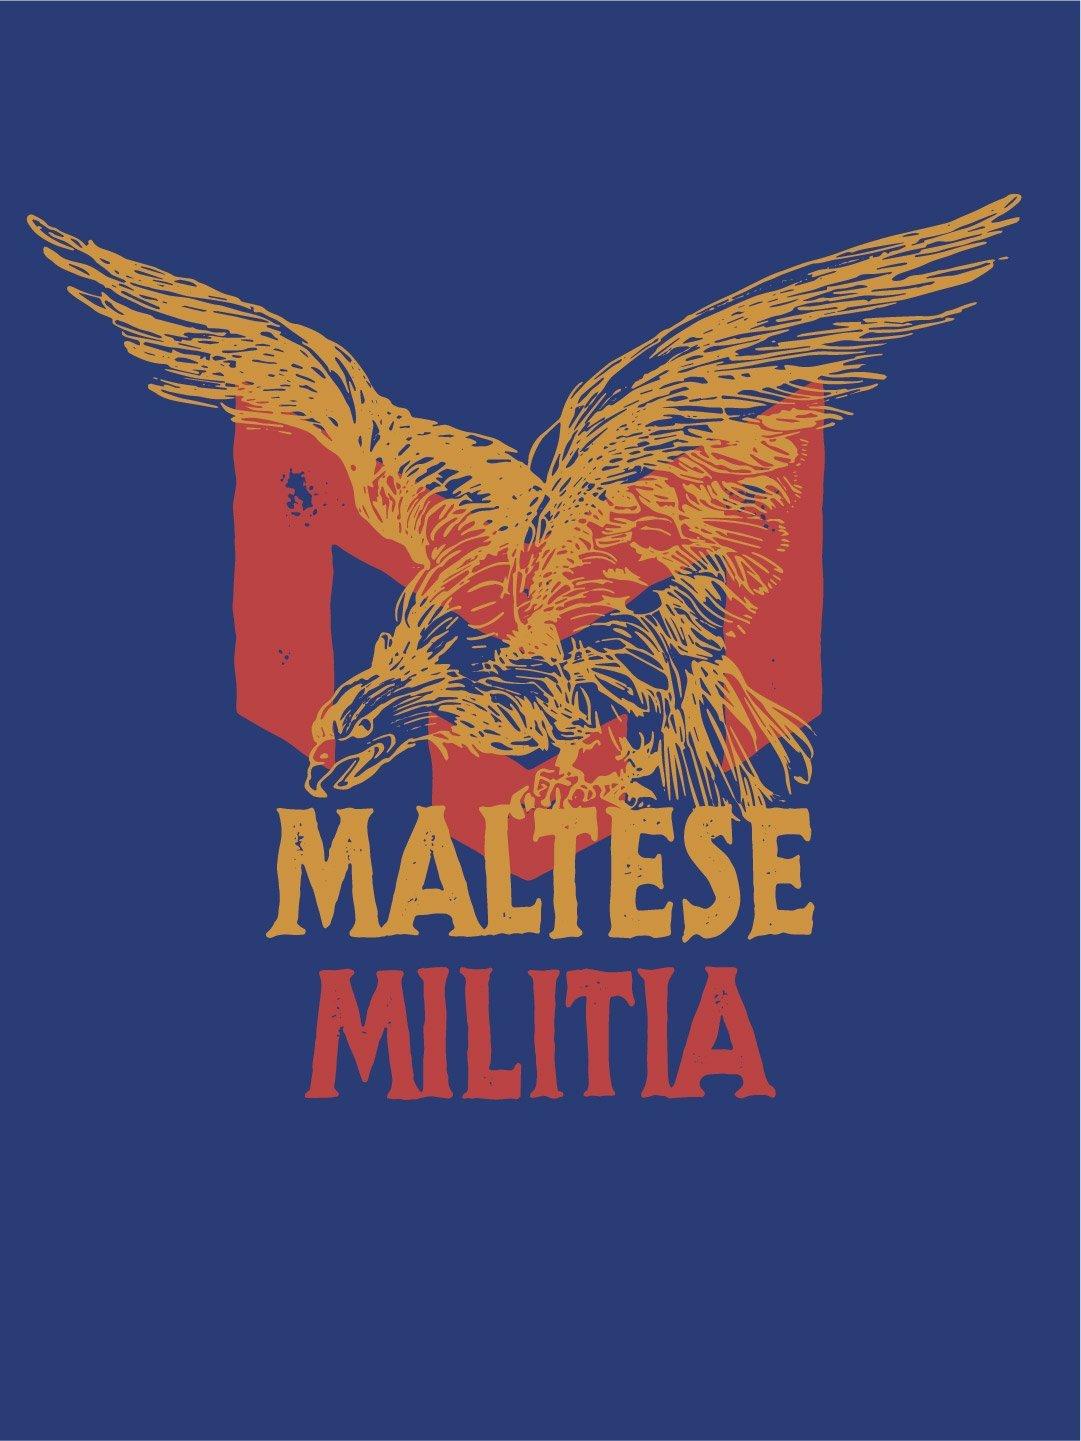 Maltese Militia Shirt Design by Jeff Finlley